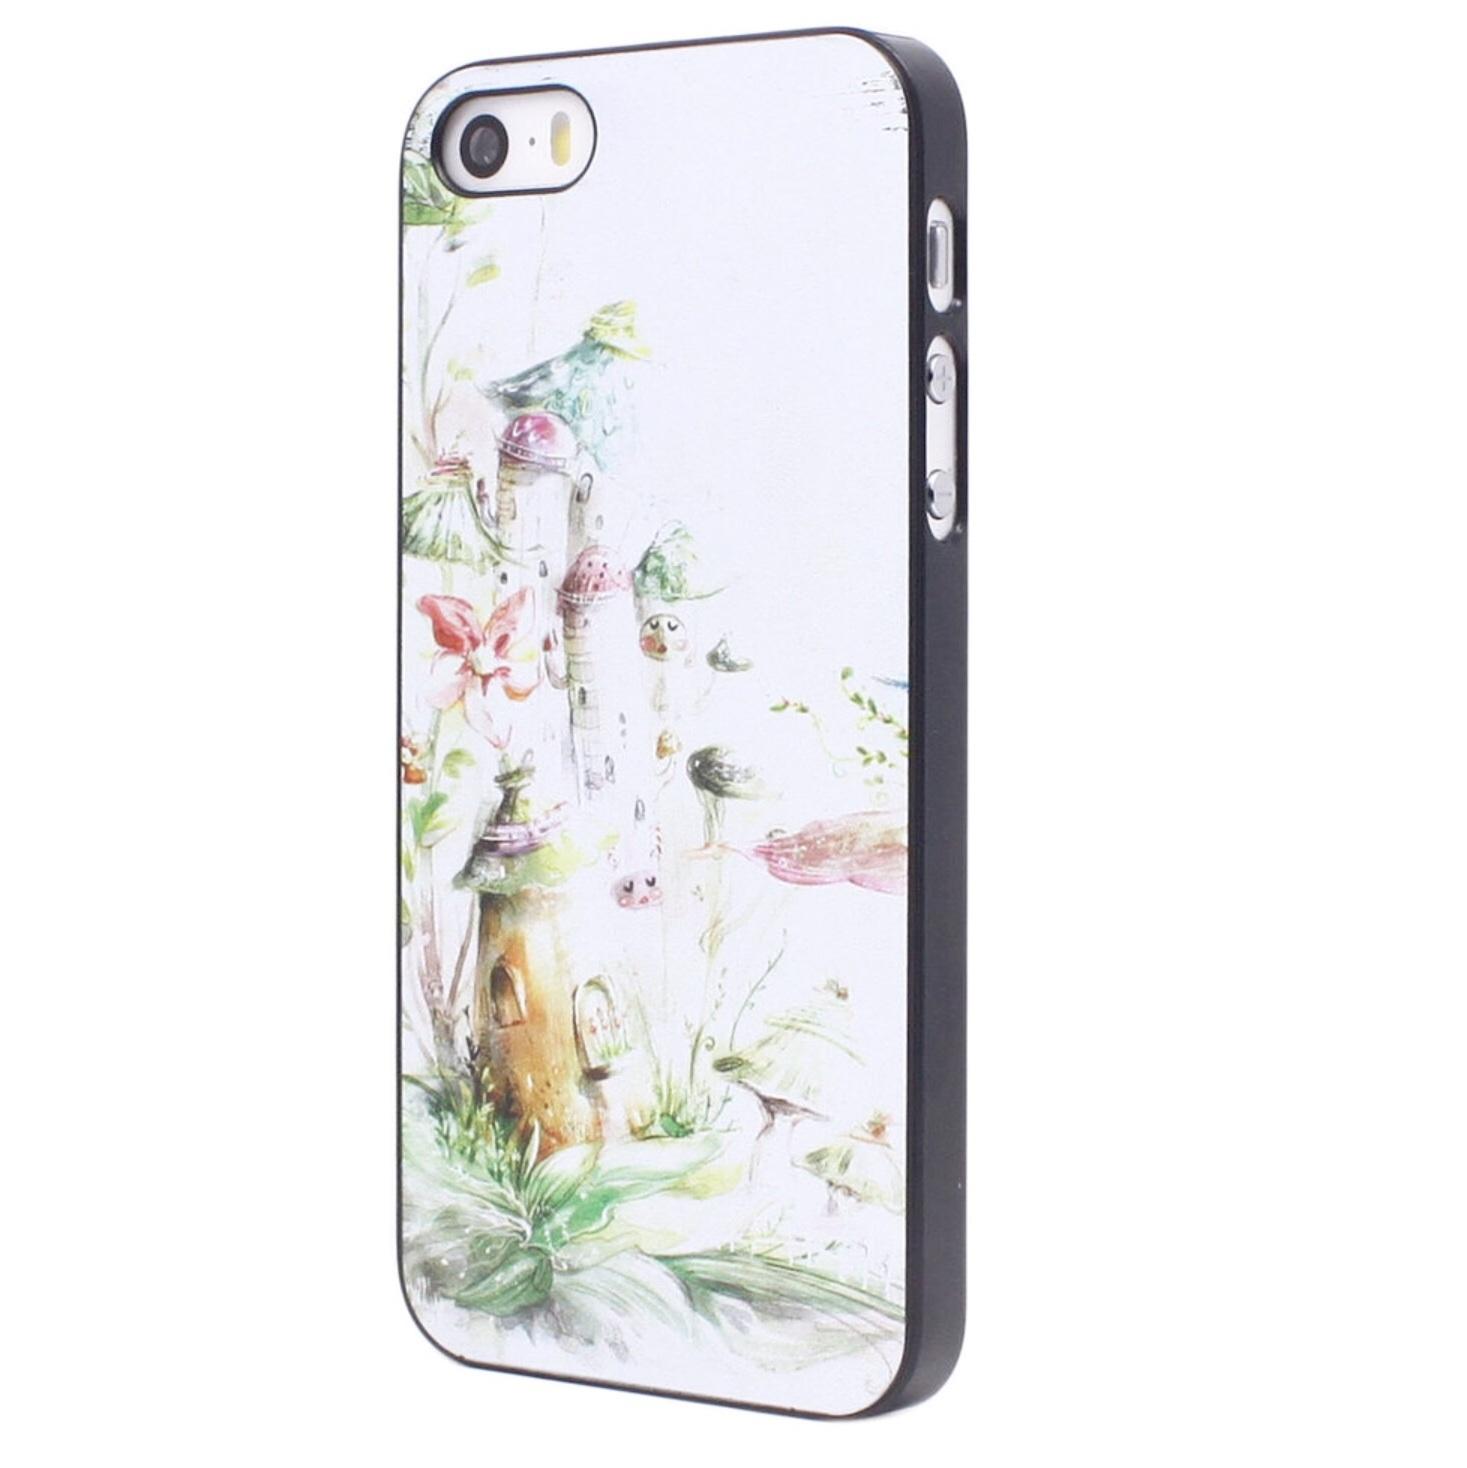 *Clearance Sale* Case iPhone 5/5s Watercolor Paint บ้านน้อยในป่า